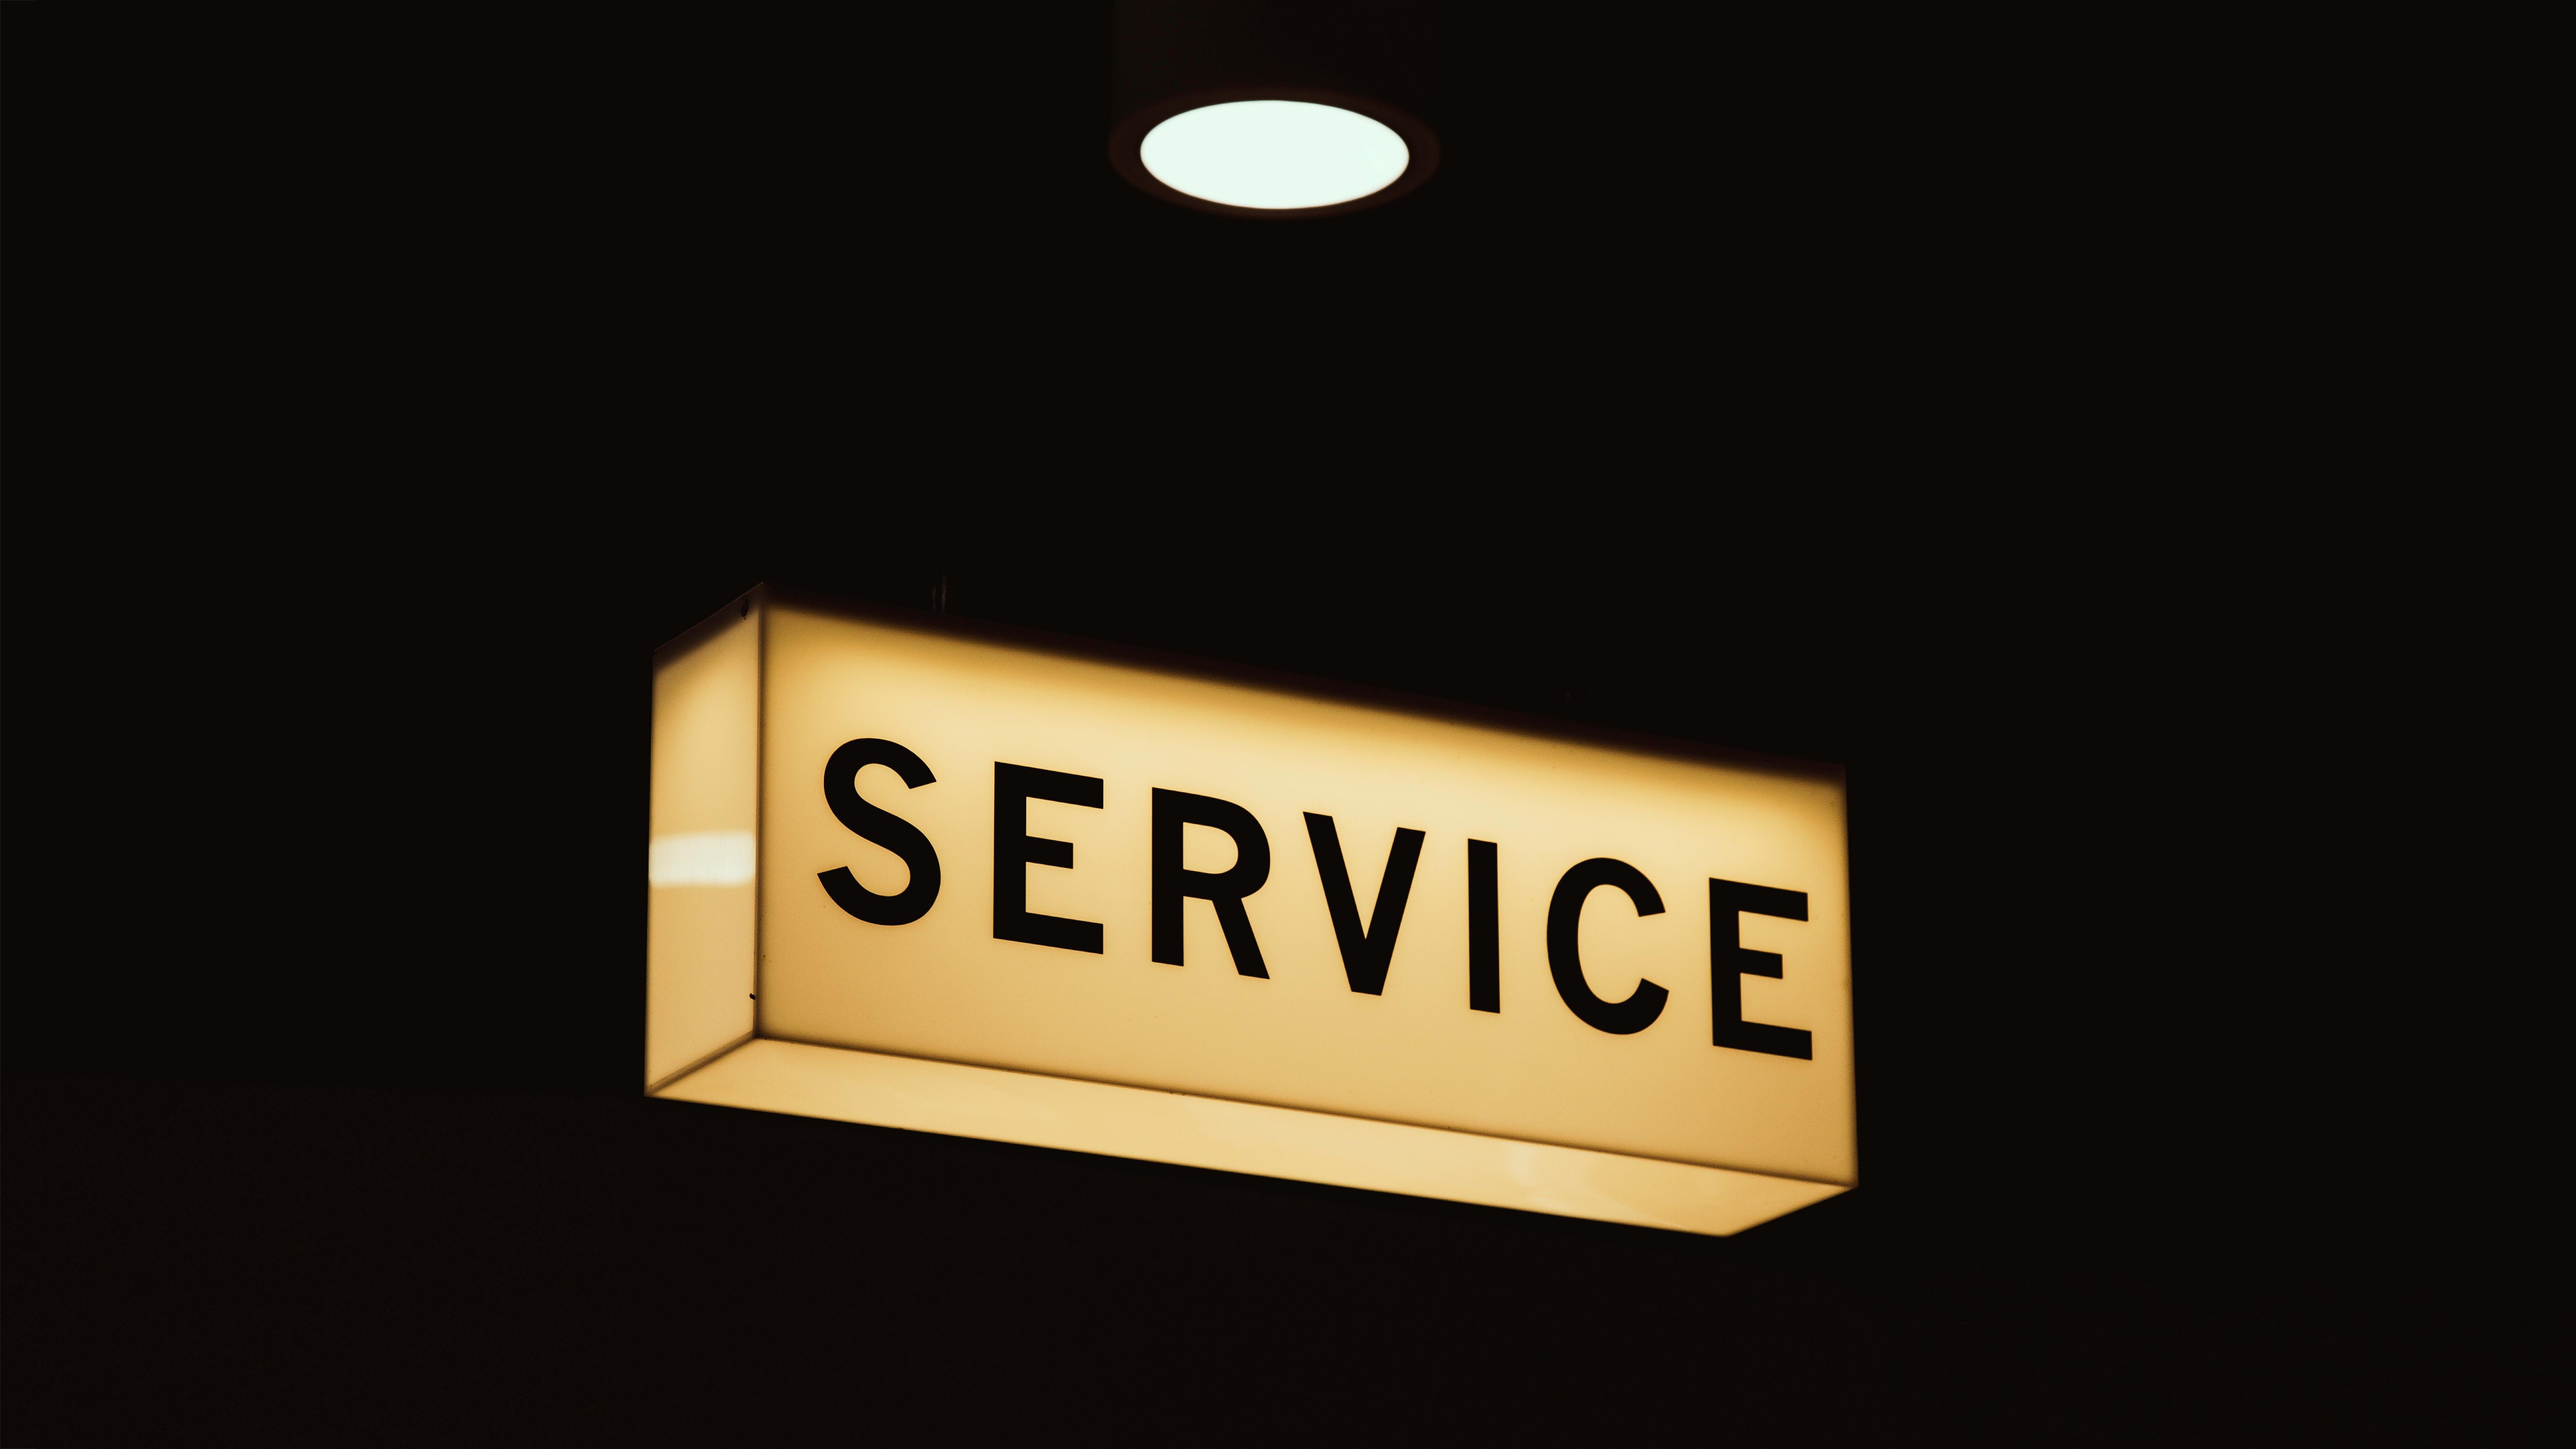 Service 24/7